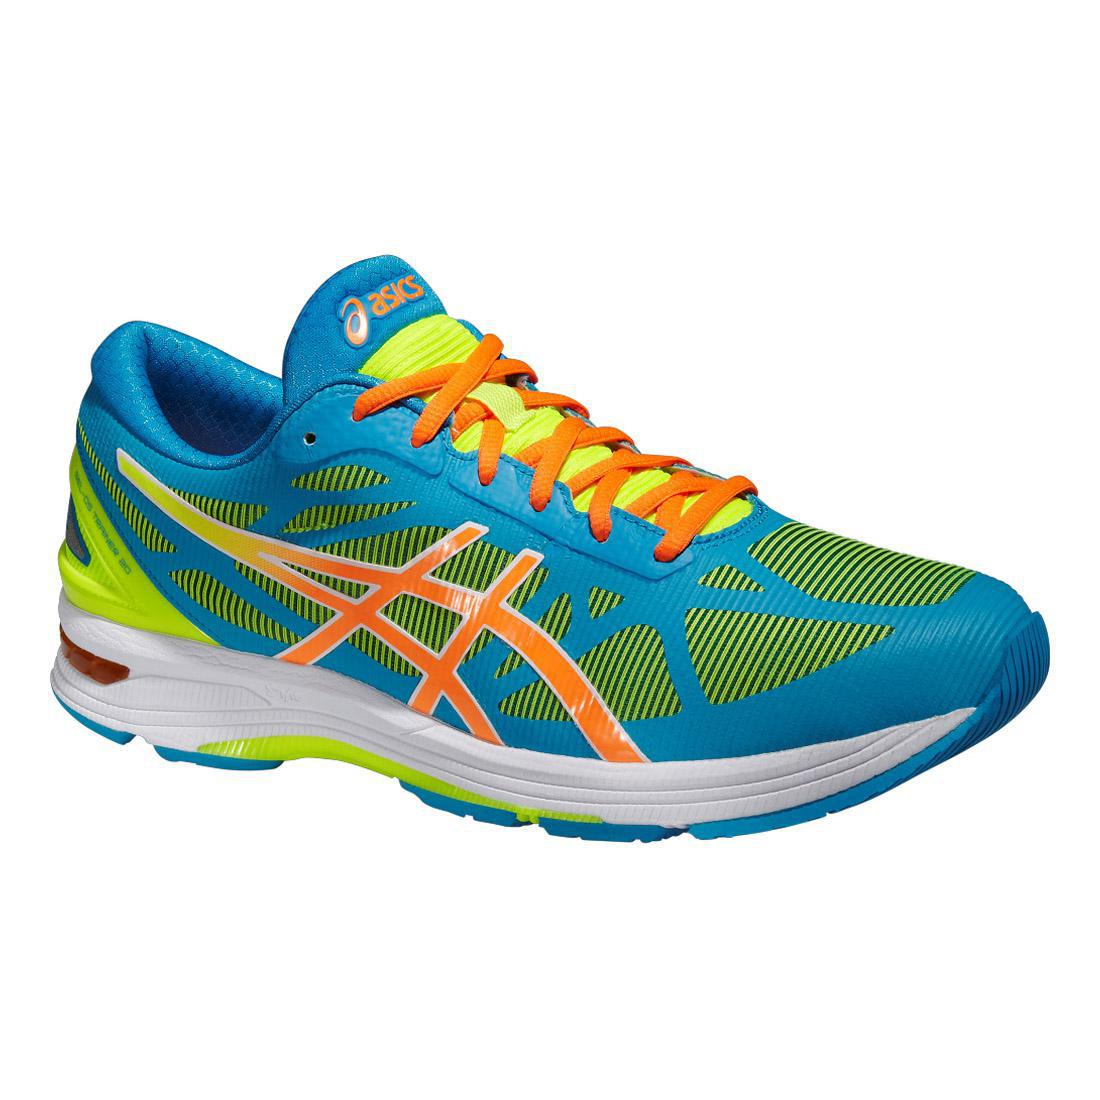 asics mens gel ds trainer 20 running shoes turquoise. Black Bedroom Furniture Sets. Home Design Ideas